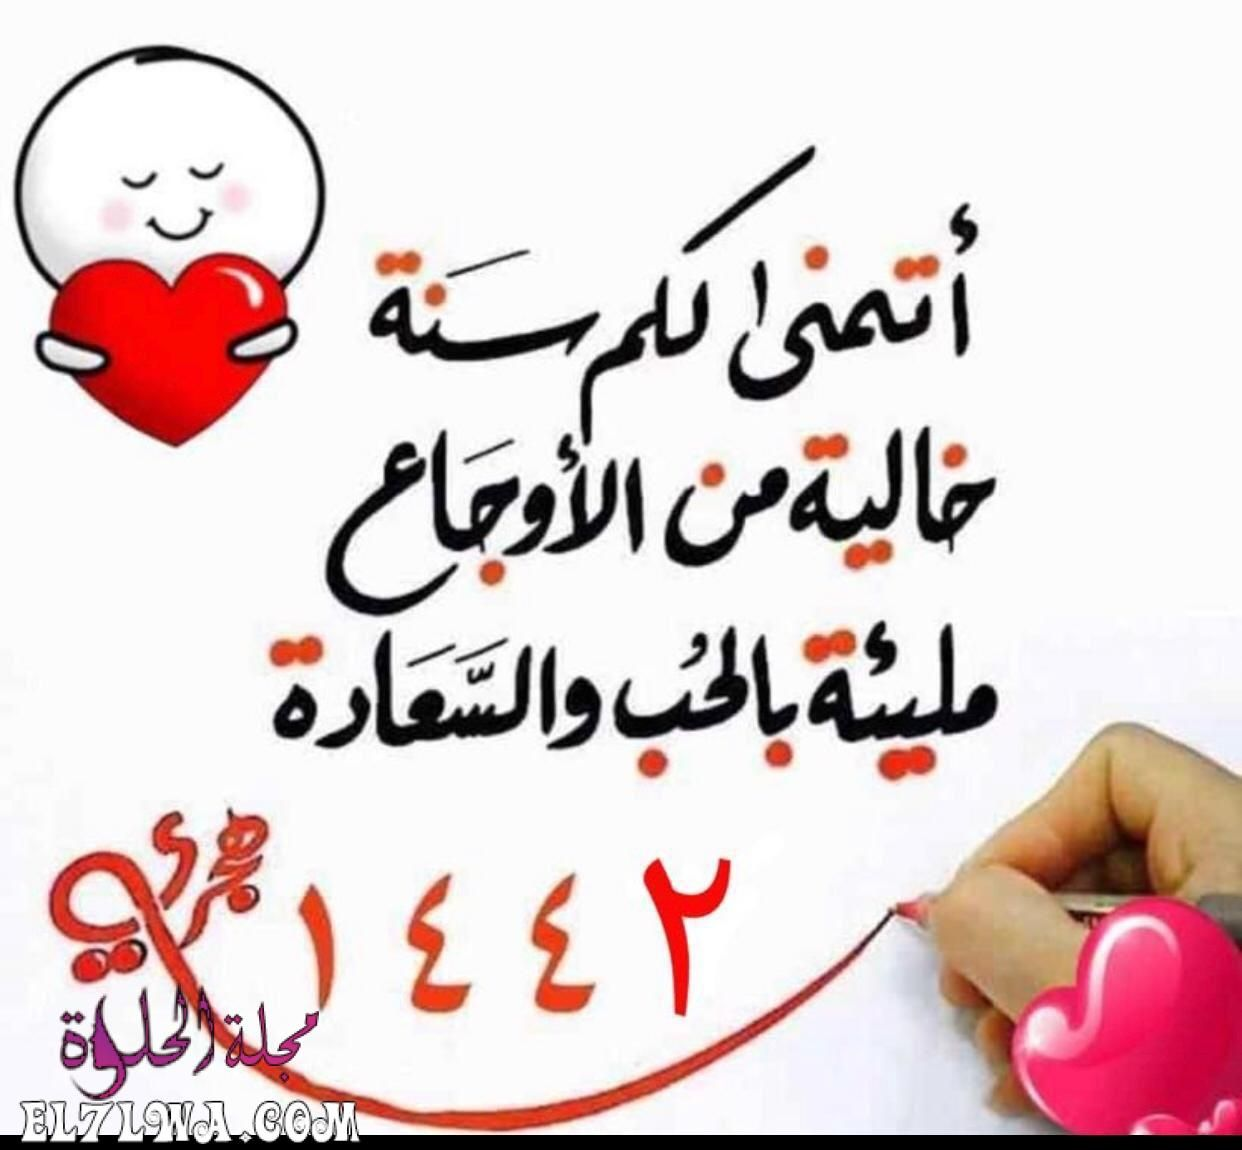 Pin By العربي للبرامج الموثوقة On التقويم الهجري 1442 والميلادي 2021 Happy Islamic New Year Islamic New Year Hijri New Year